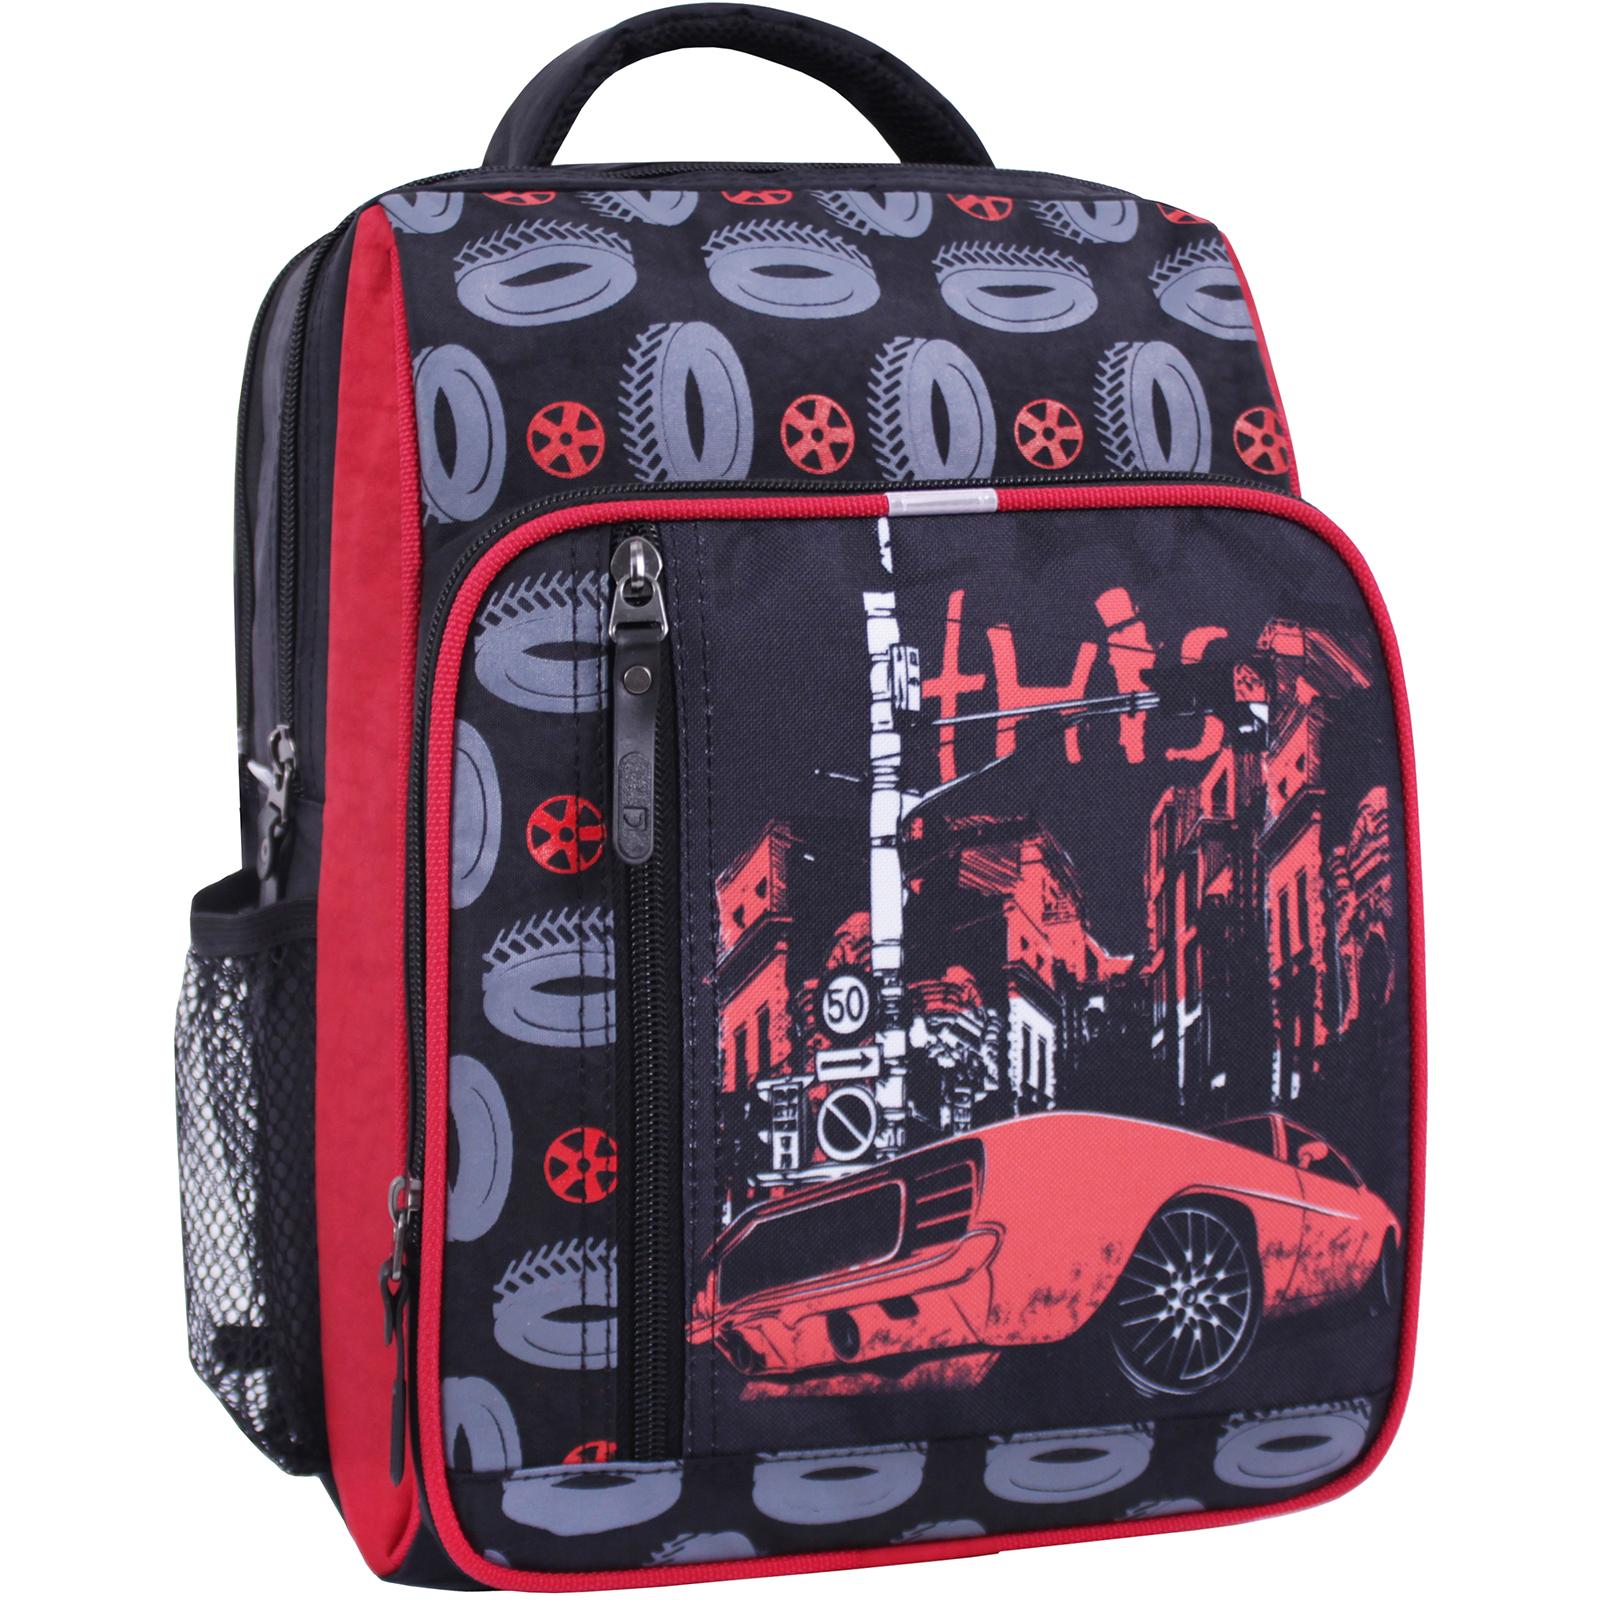 Школьные рюкзаки Рюкзак школьный Bagland Школьник 8 л. черный 568 (0012870) IMG_0995_суб.568_.JPG